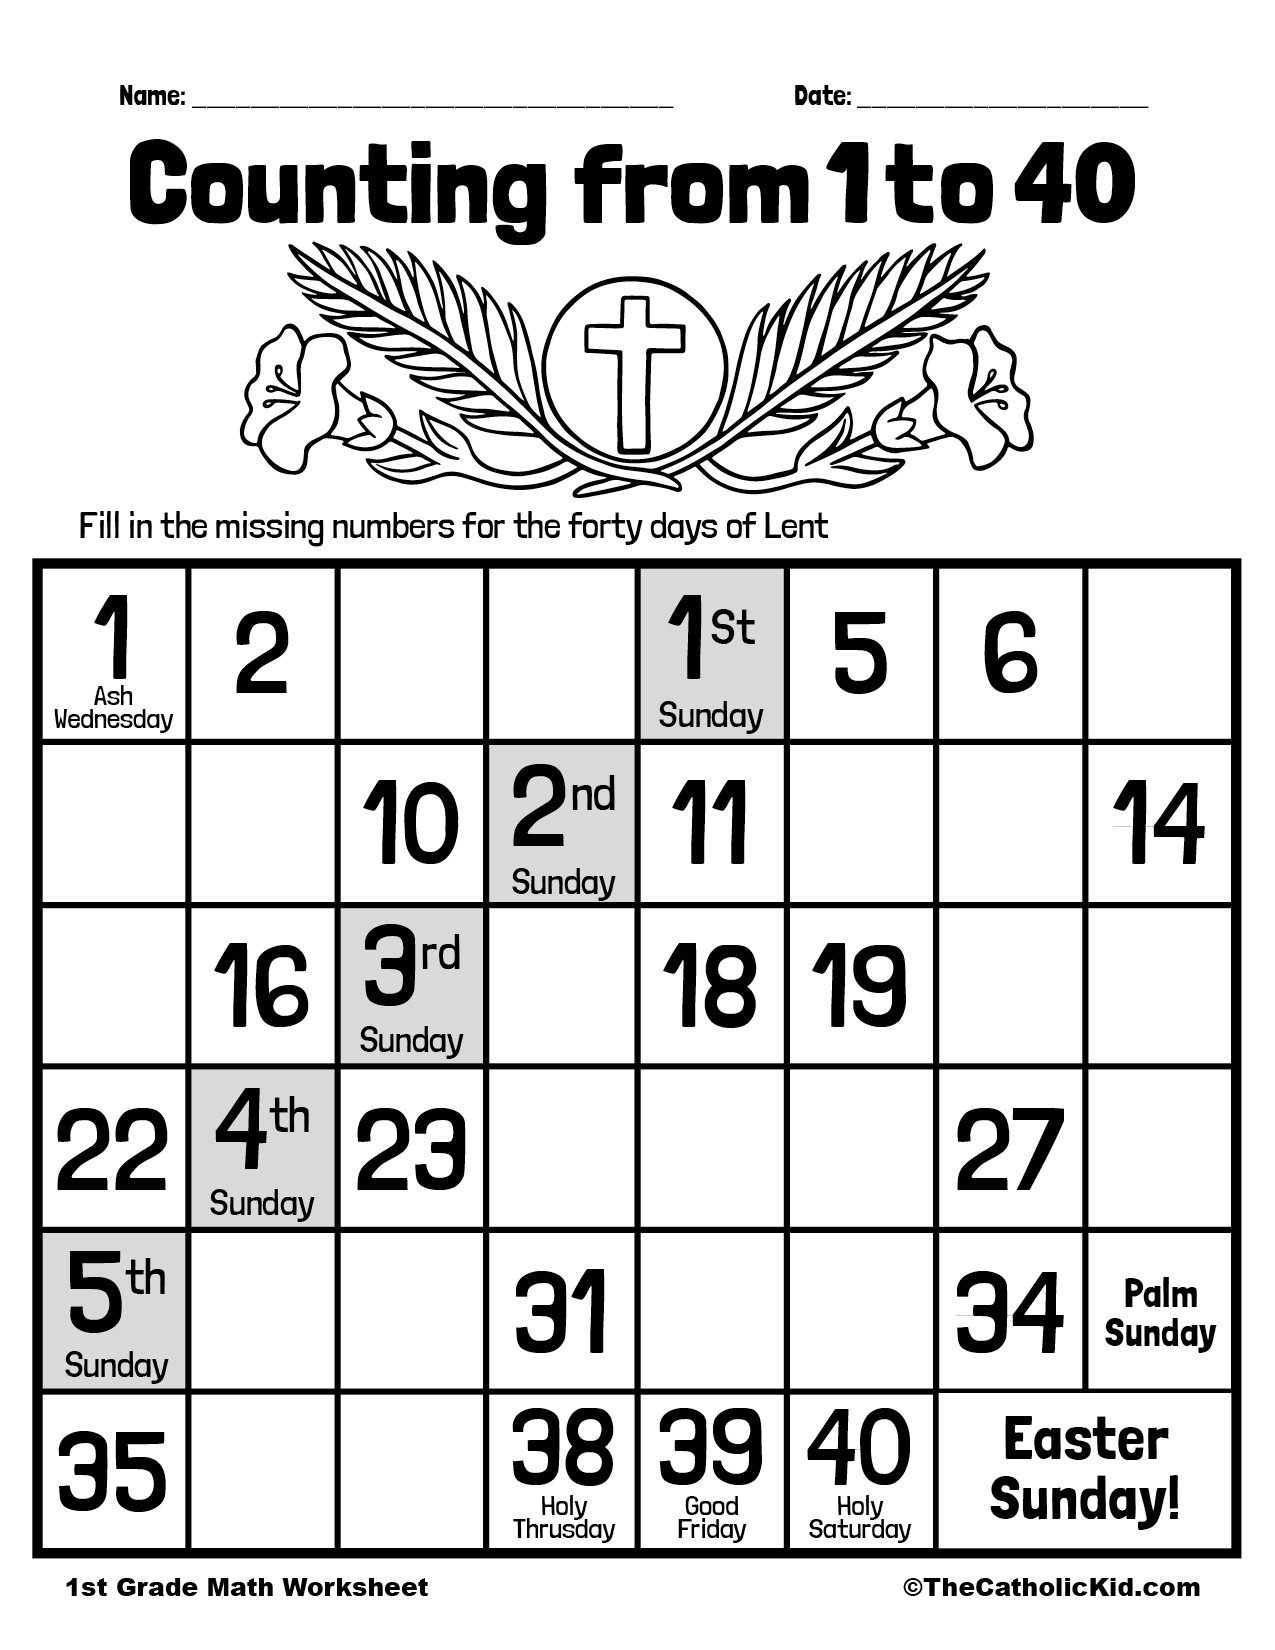 Count to 40 - 1st Grade Math Worksheet Catholic